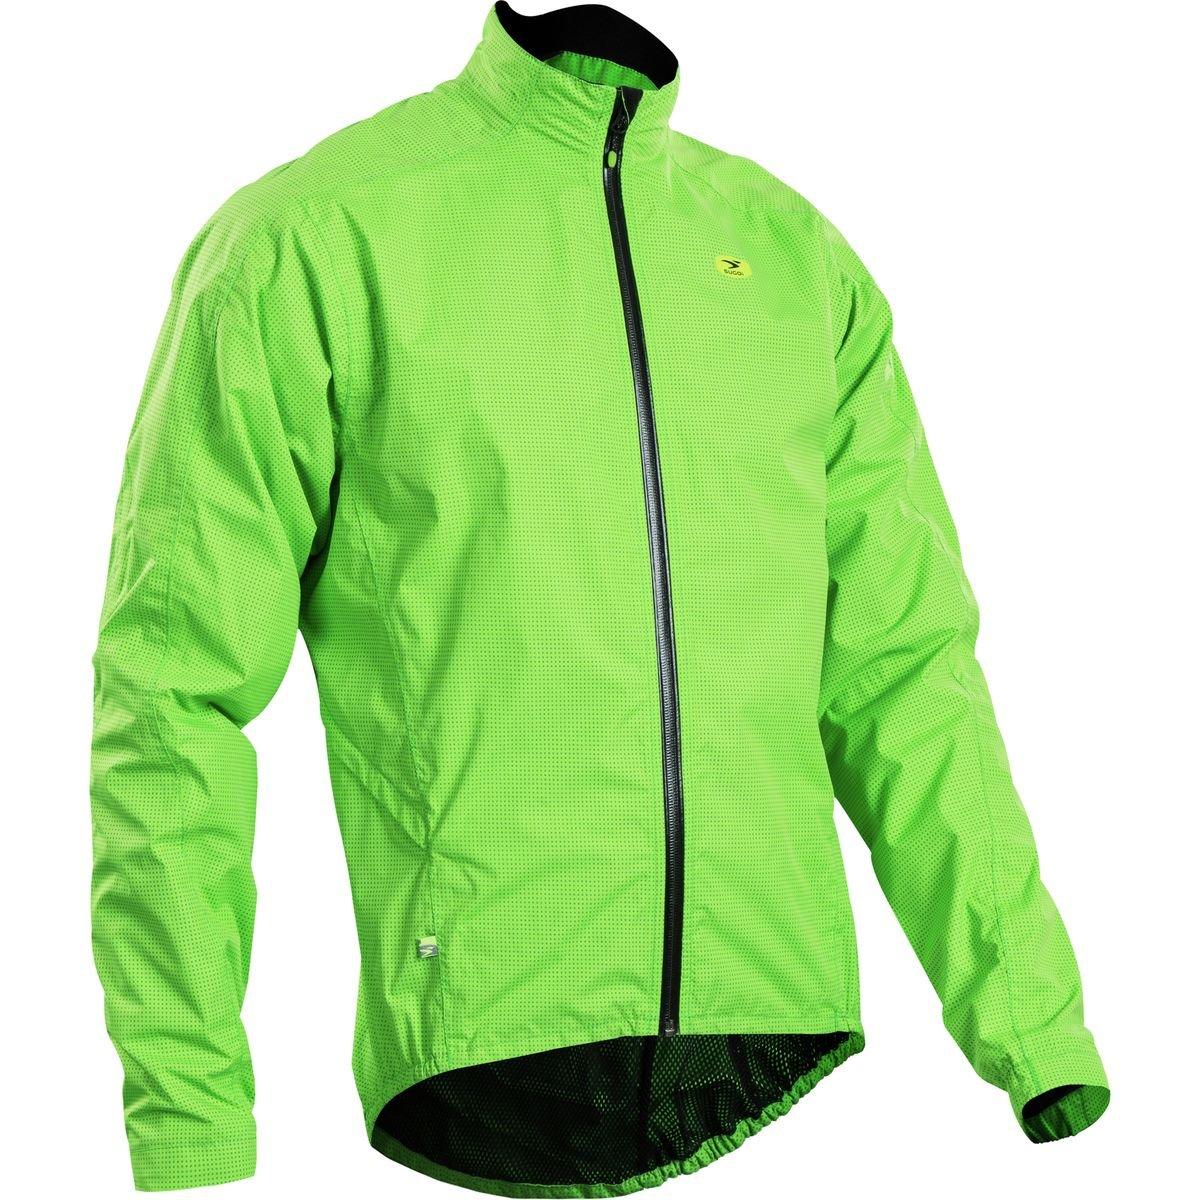 SUGOi Zap Bike Jacket - Men's Berzerker Green, XL by SUGOi